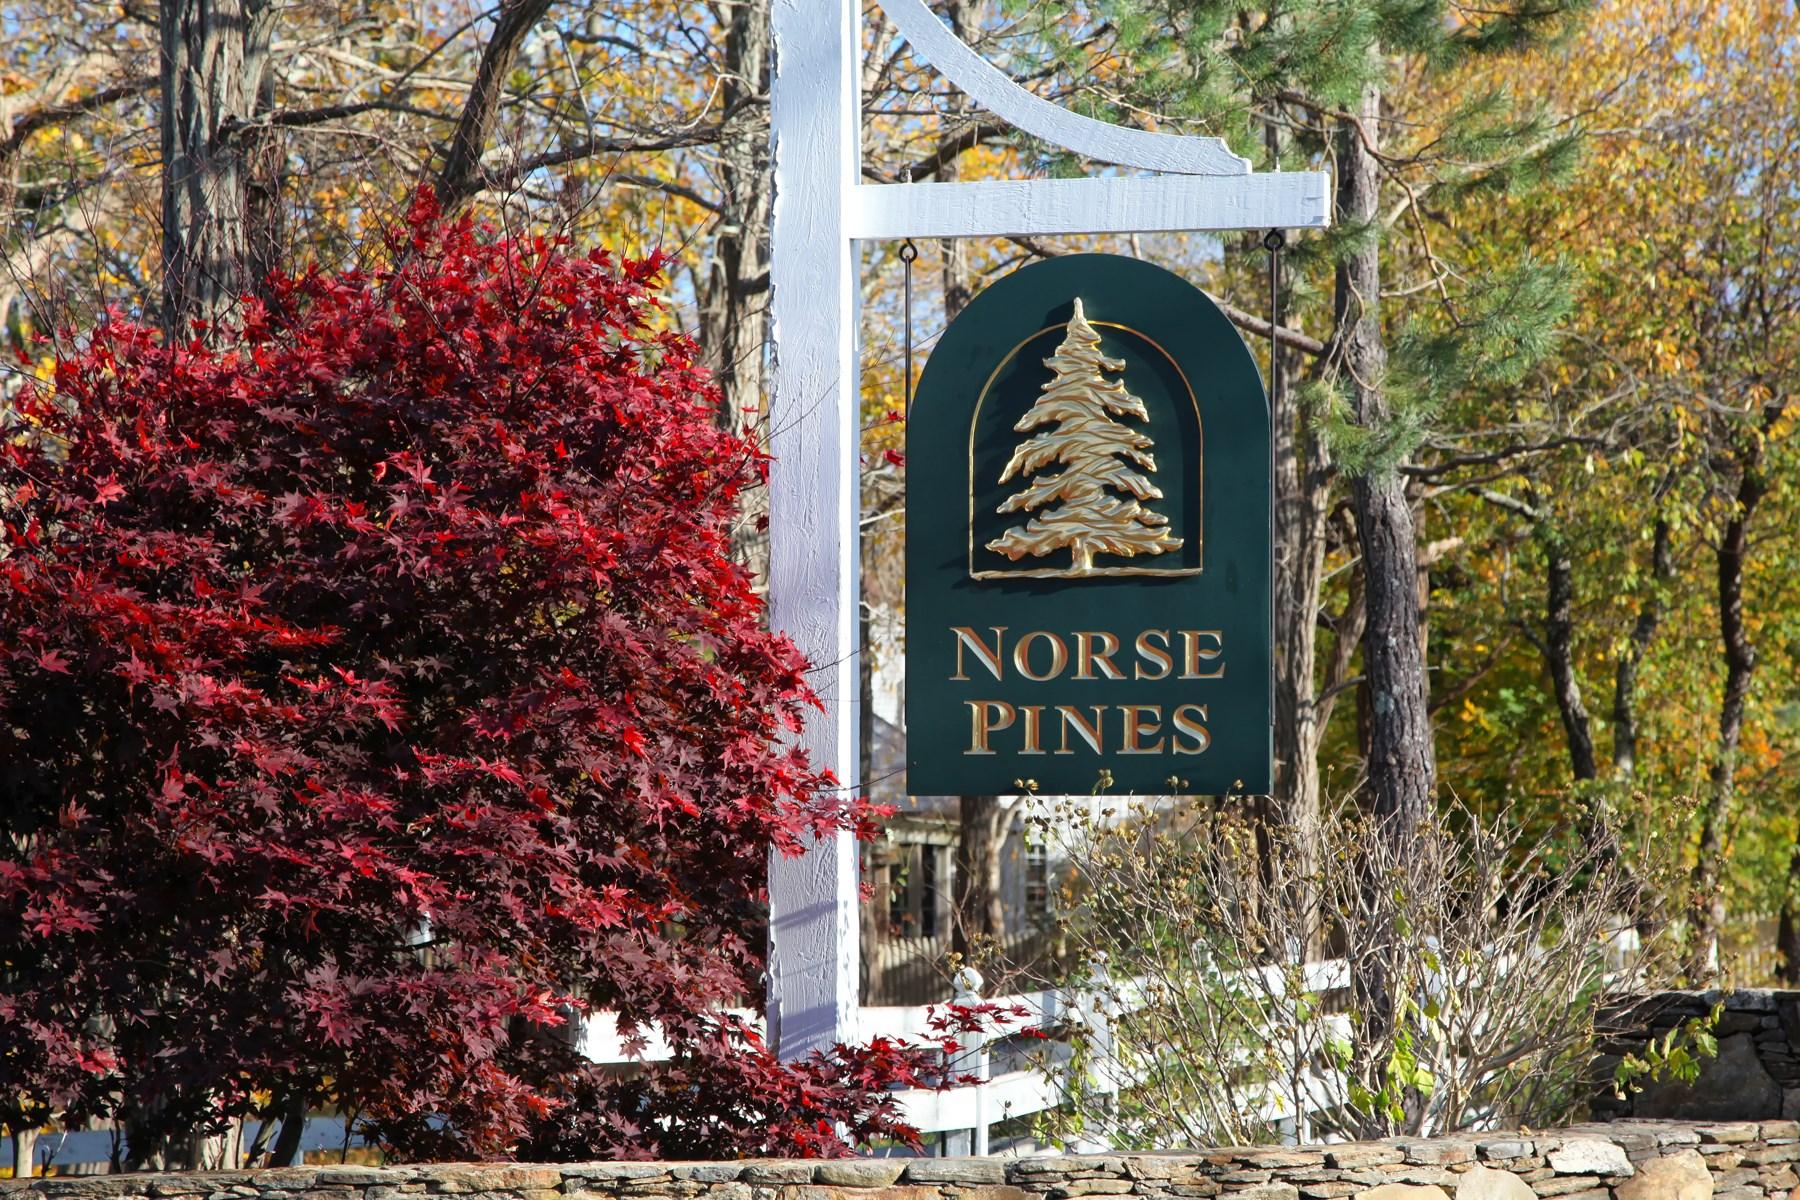 Terreno para Venda às Buildable Lot on North Side of 6A 11 Norse Pines Drive East Sandwich, Massachusetts, 02537 Estados Unidos